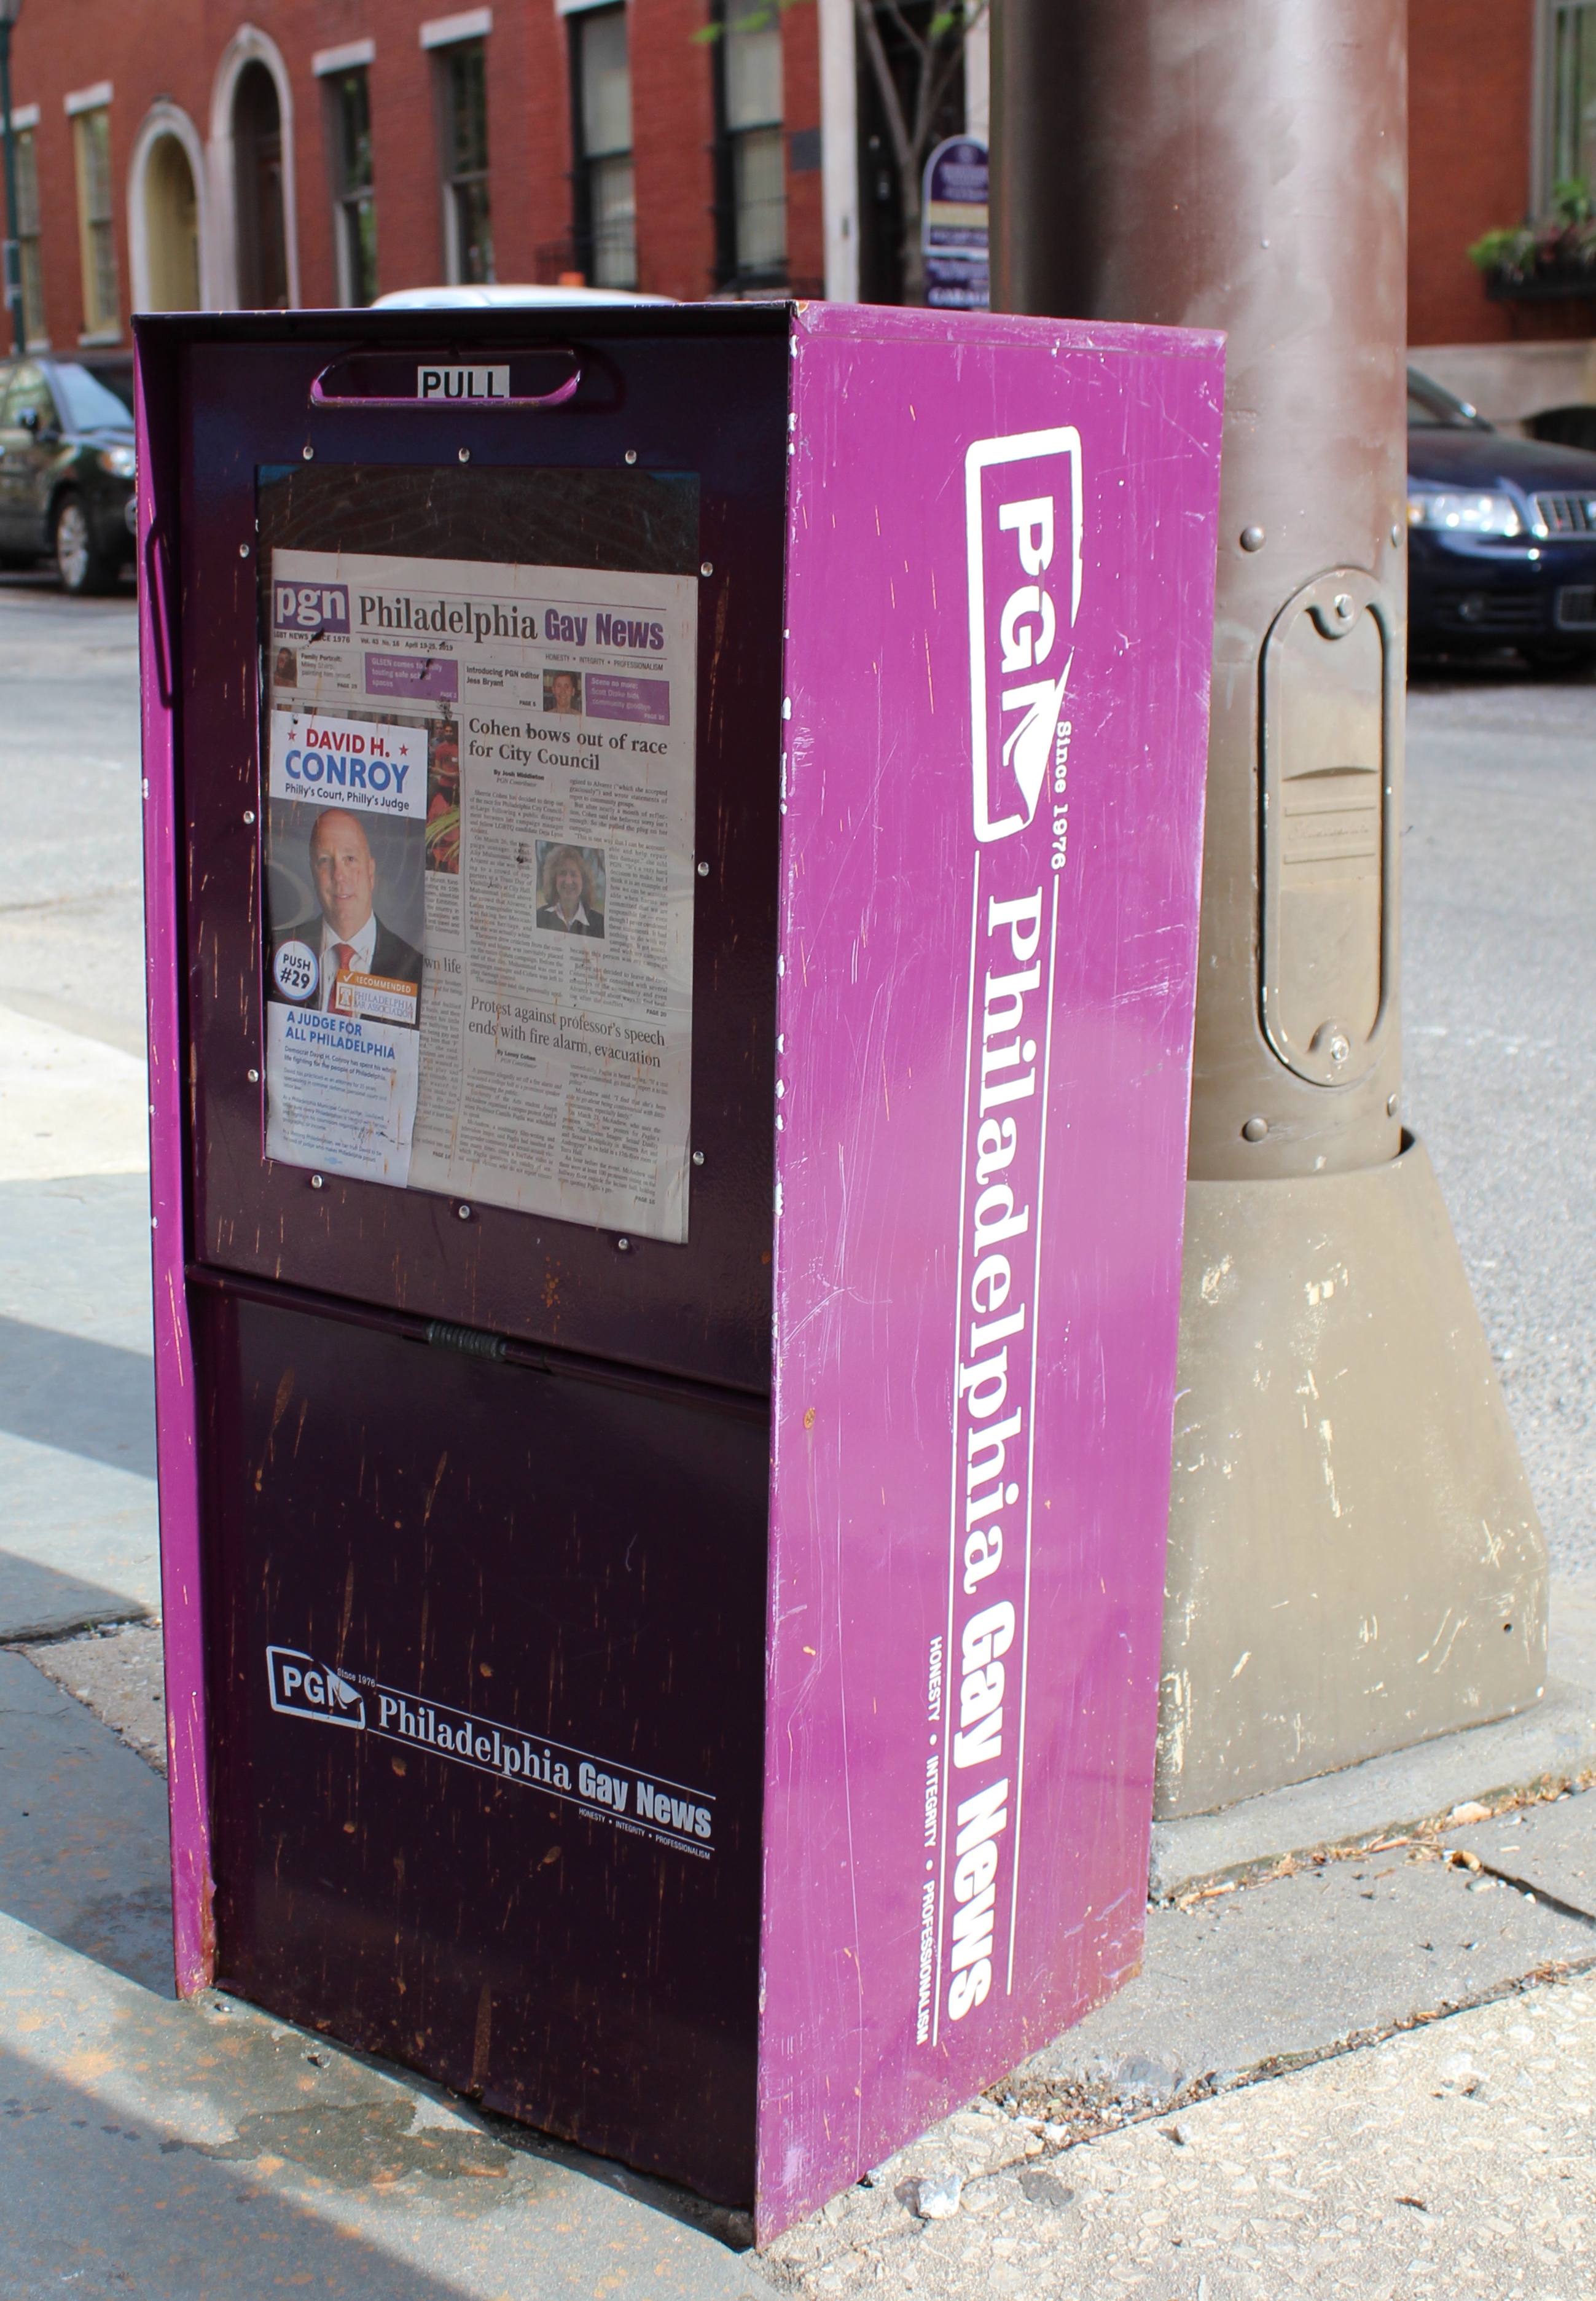 Philadelphia Gay News - Wikipedia